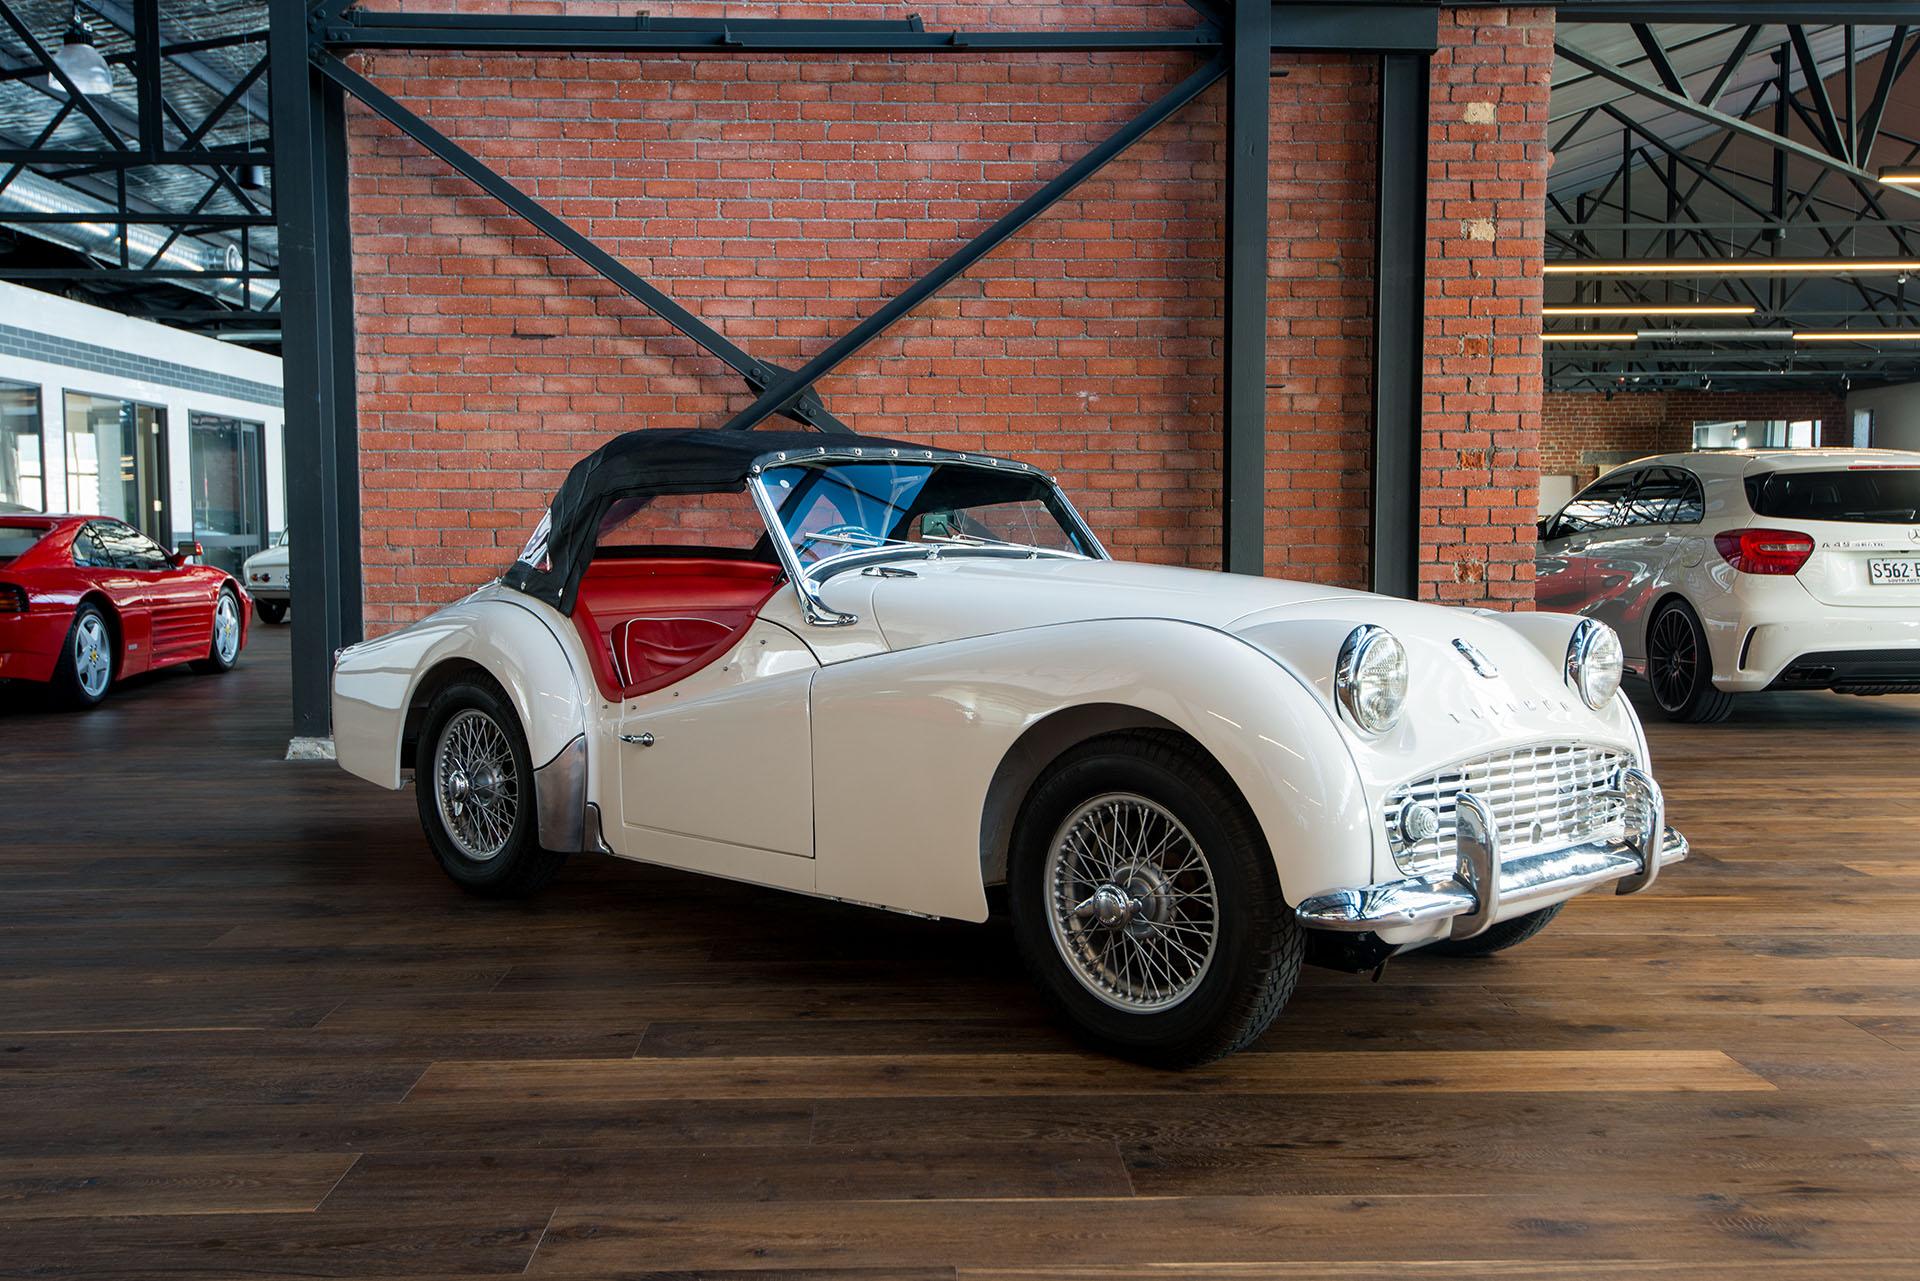 1960 triumph tr3a richmonds classic and prestige cars storage and sales adelaide australia. Black Bedroom Furniture Sets. Home Design Ideas